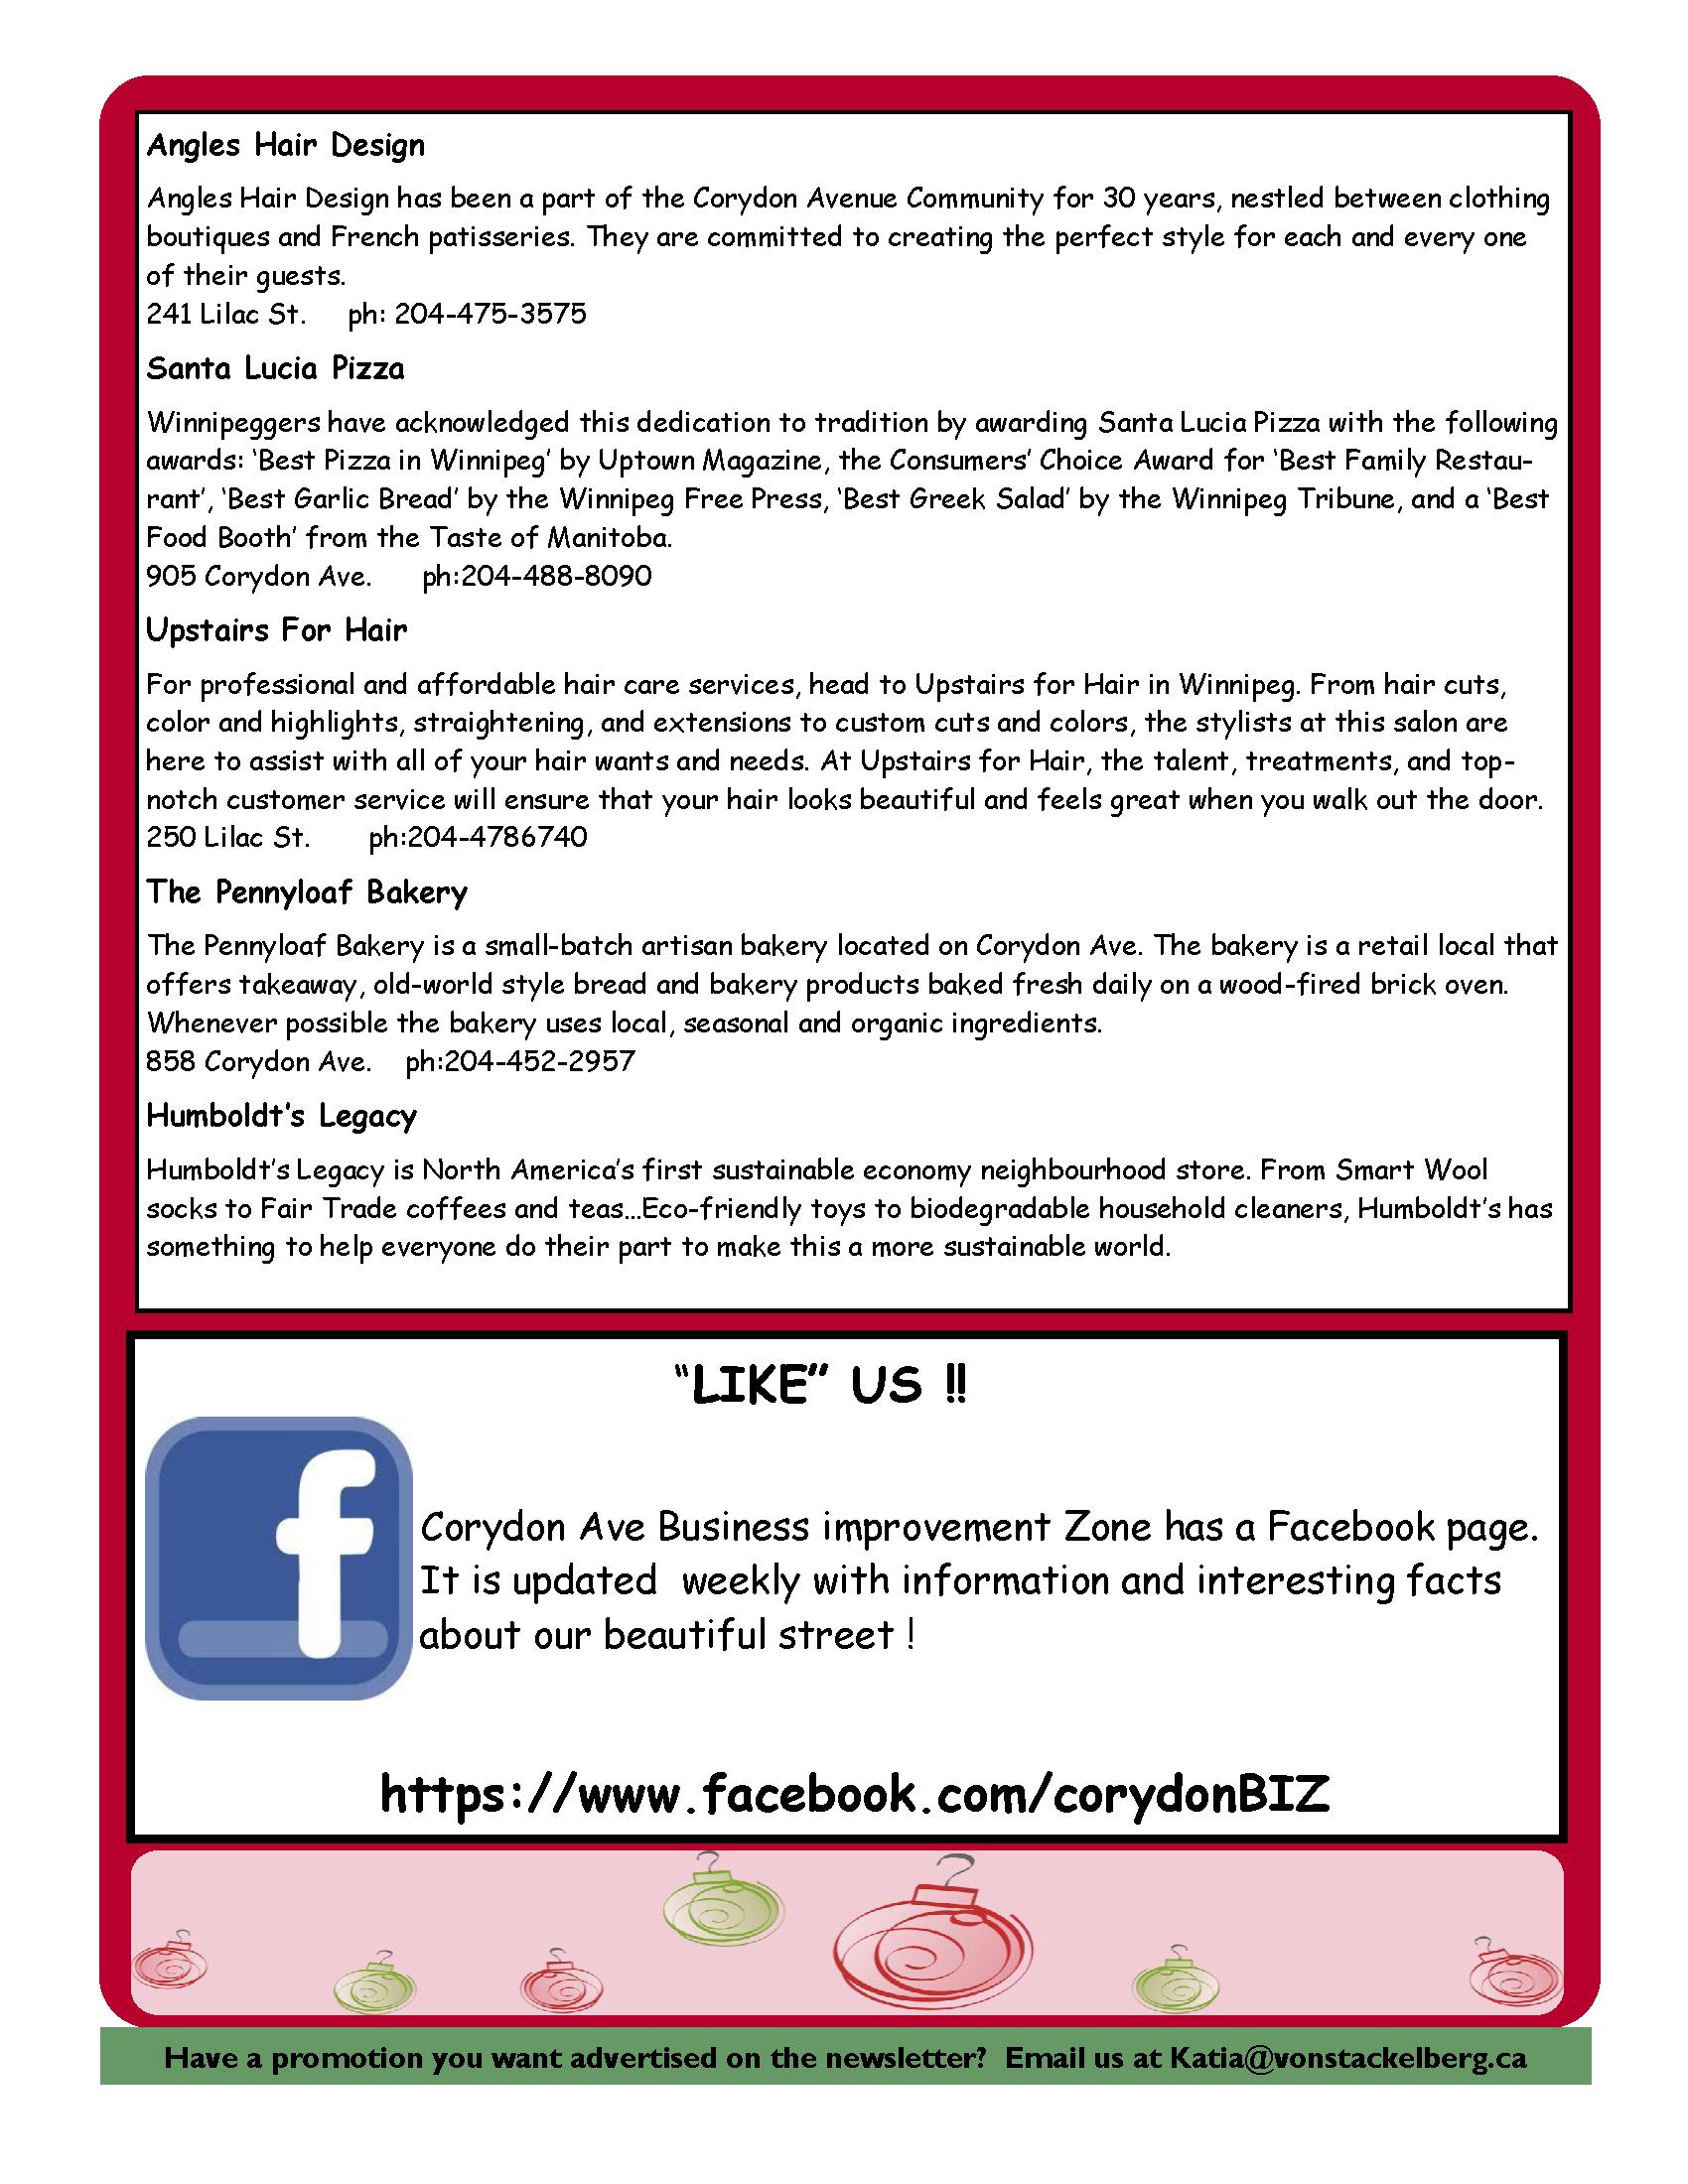 Winter2016 BIZ newsletter_Page_11.png